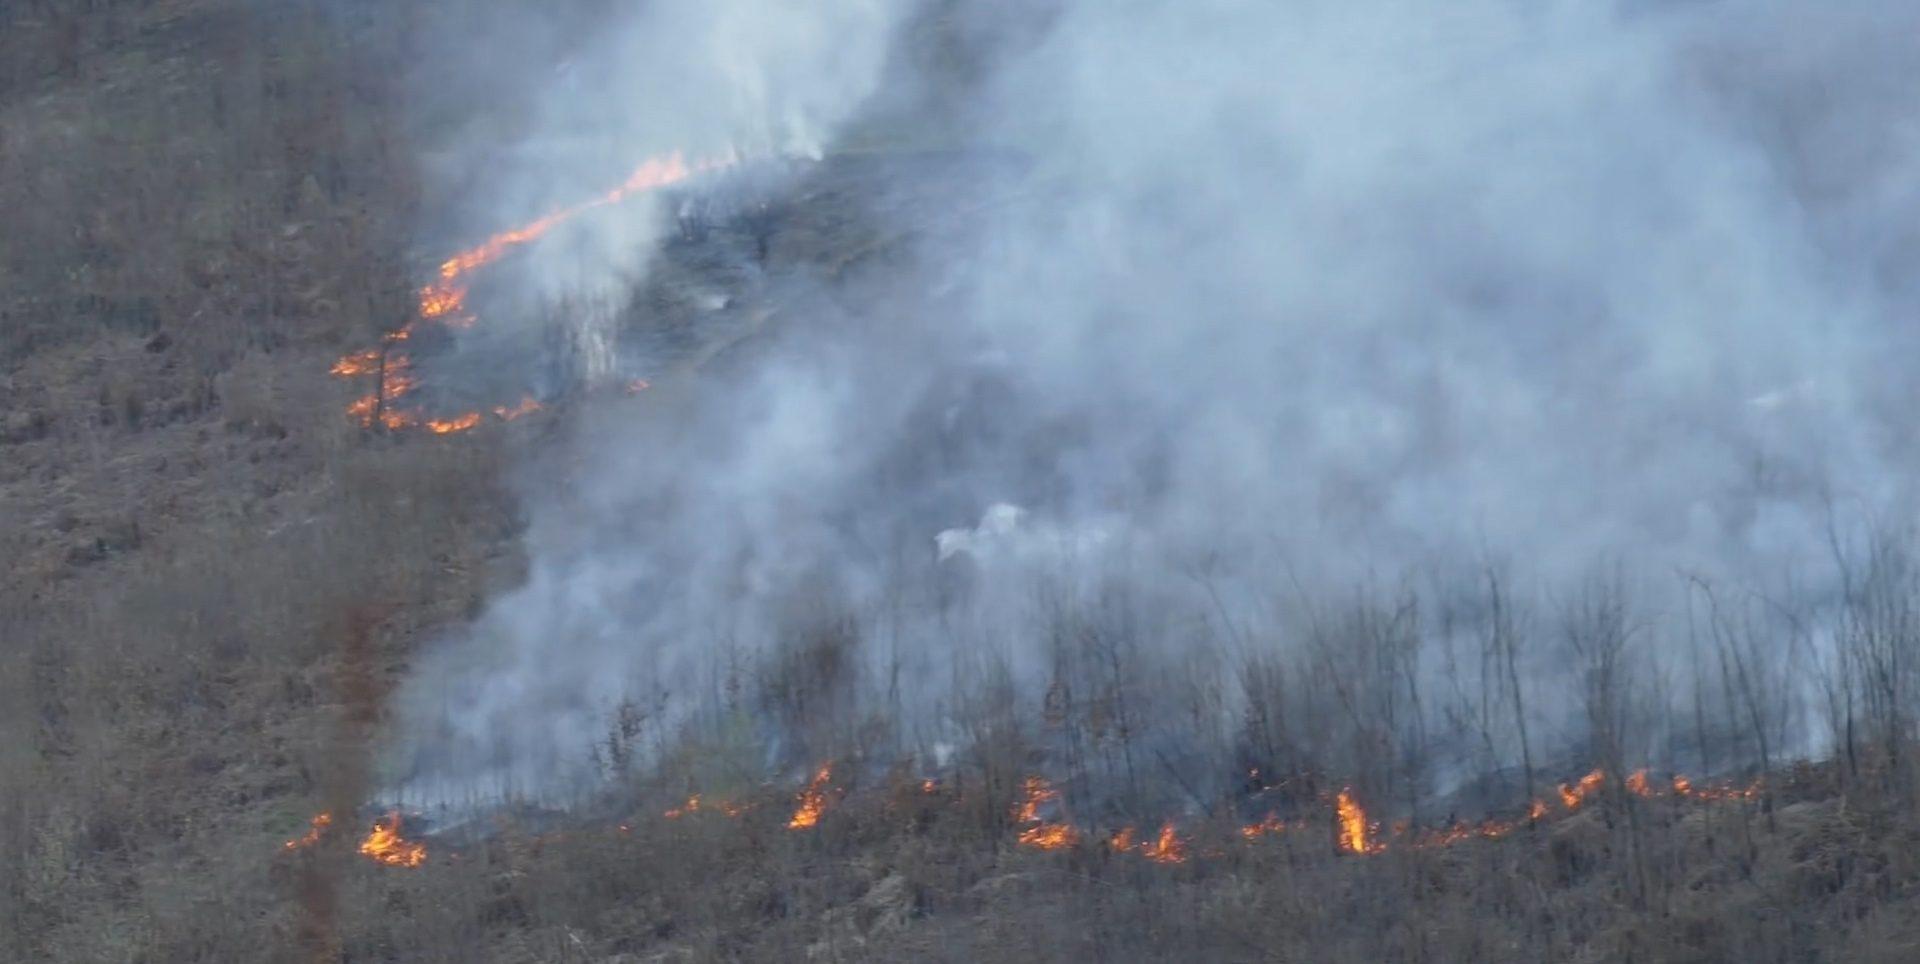 Četrdesetak intervencija u Sanskom Mostu zbog požara